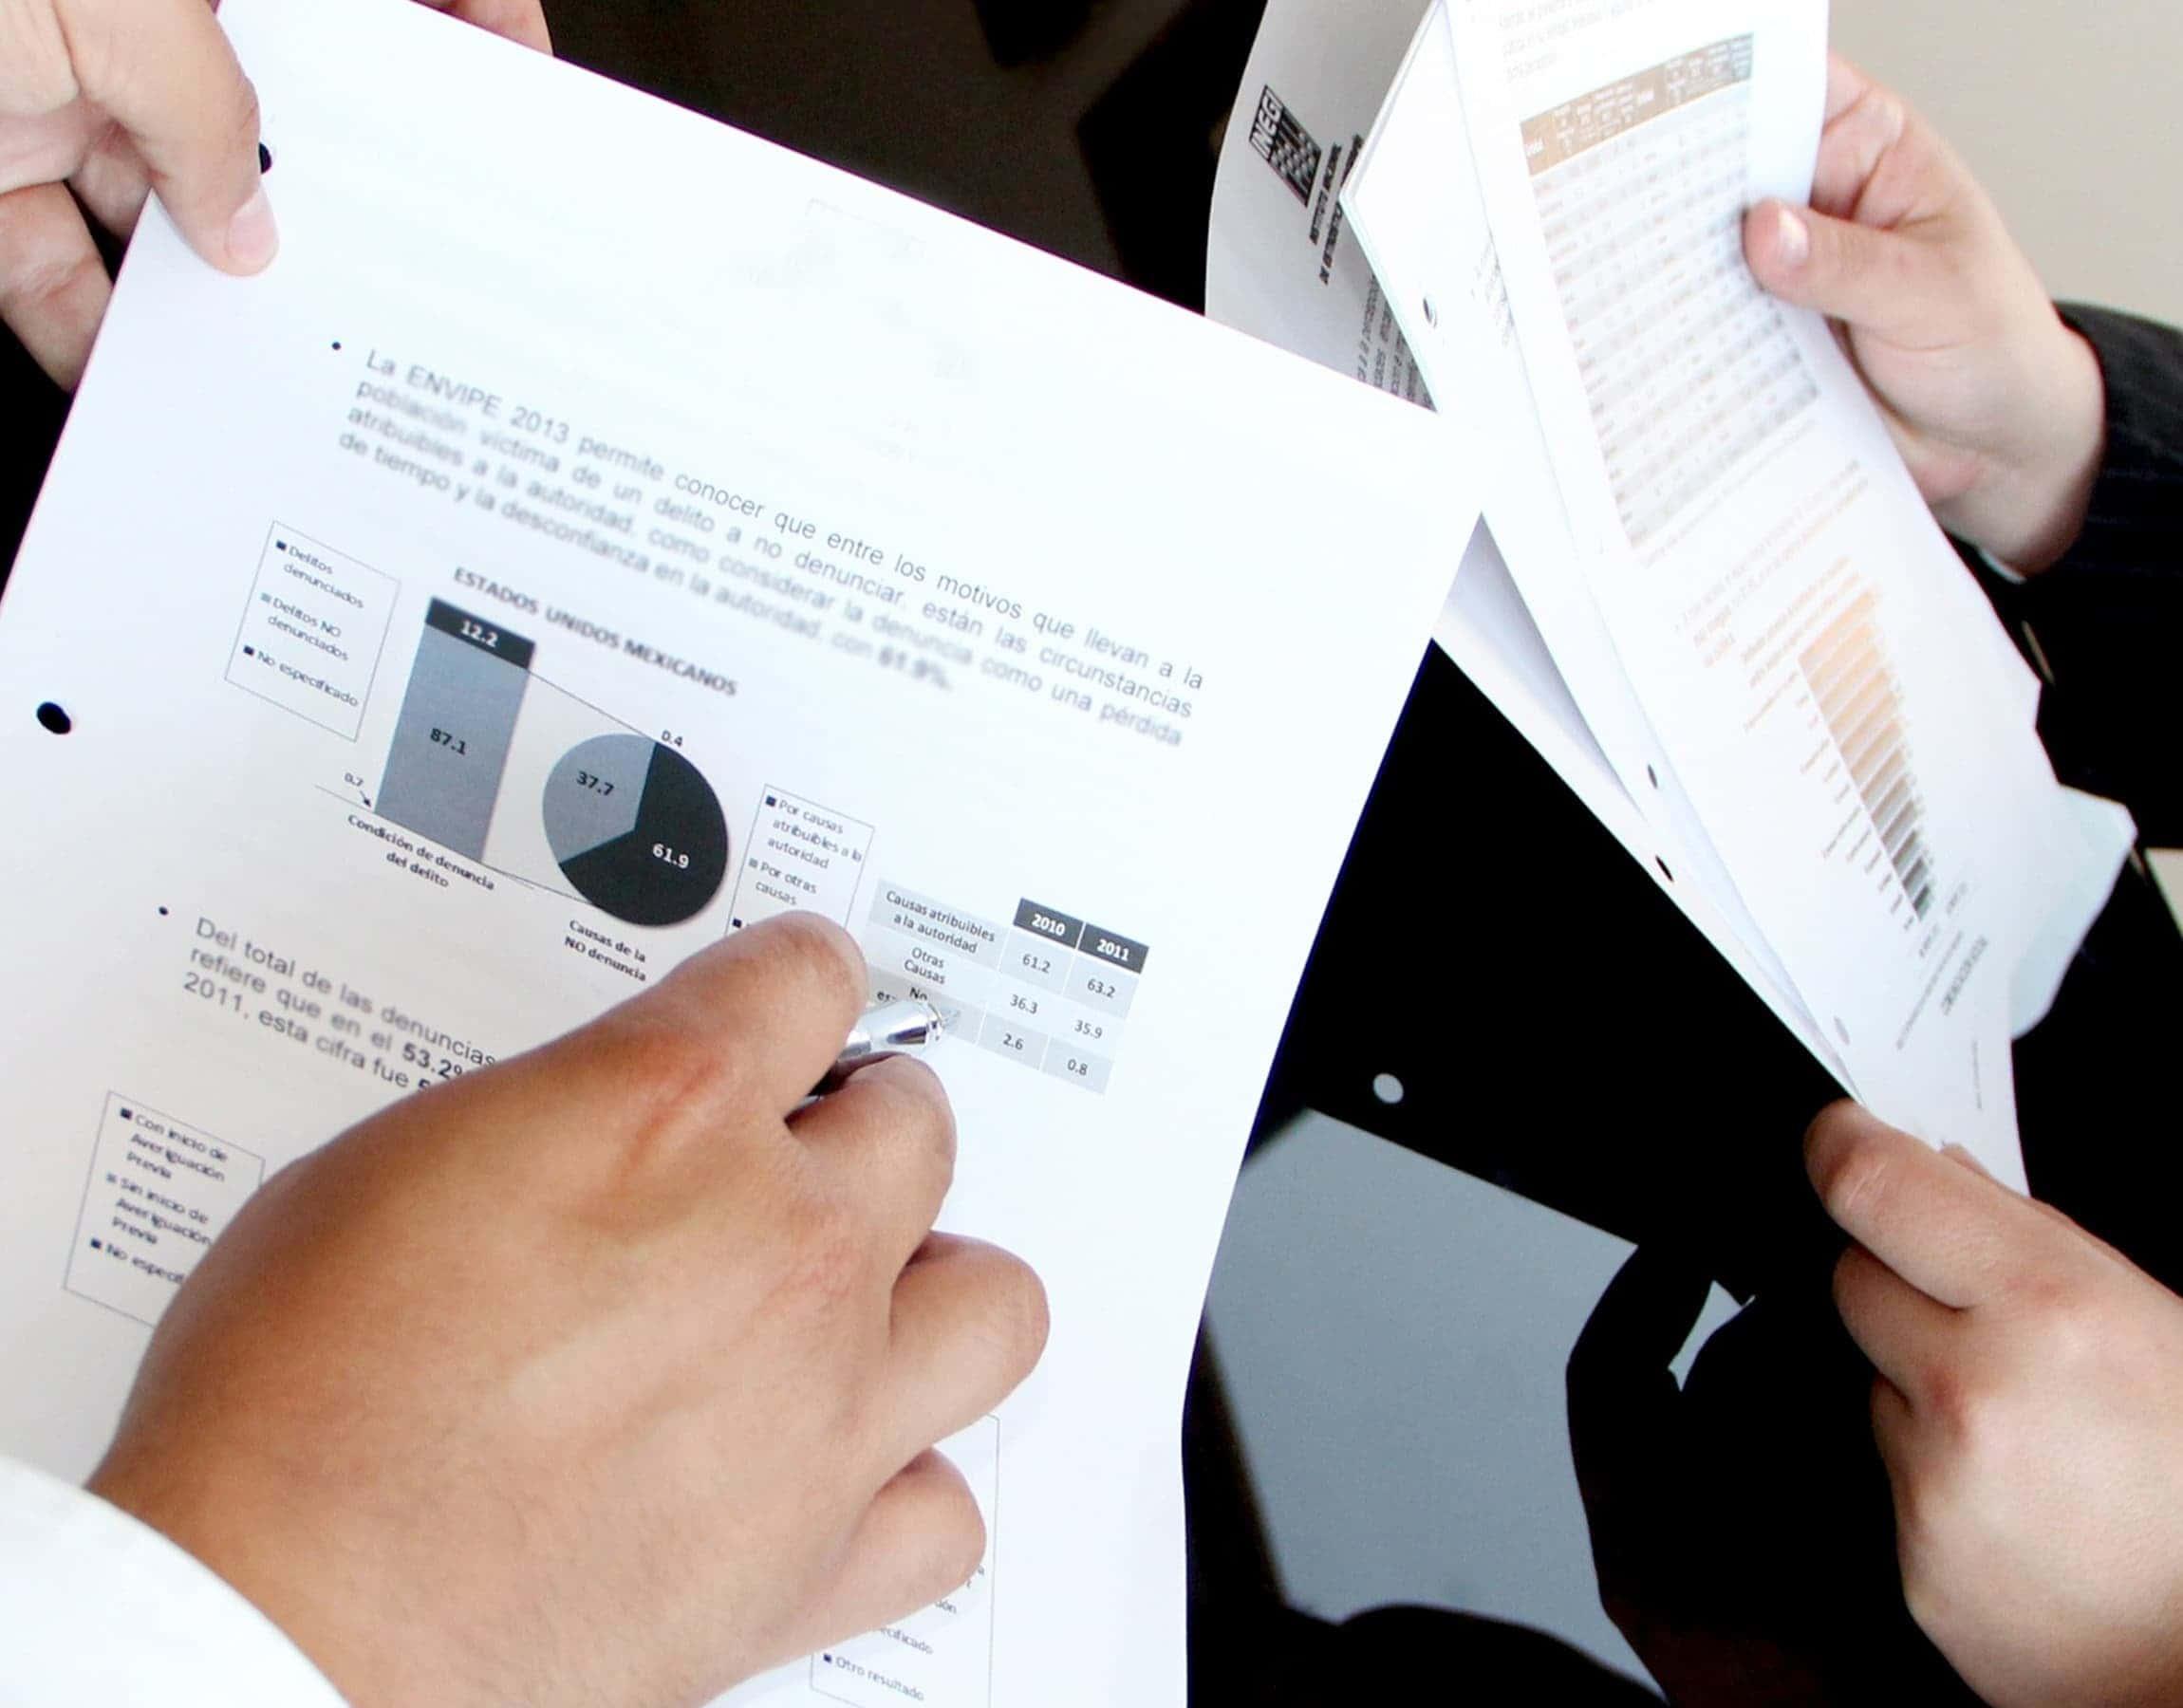 Analisi documenti finanziari